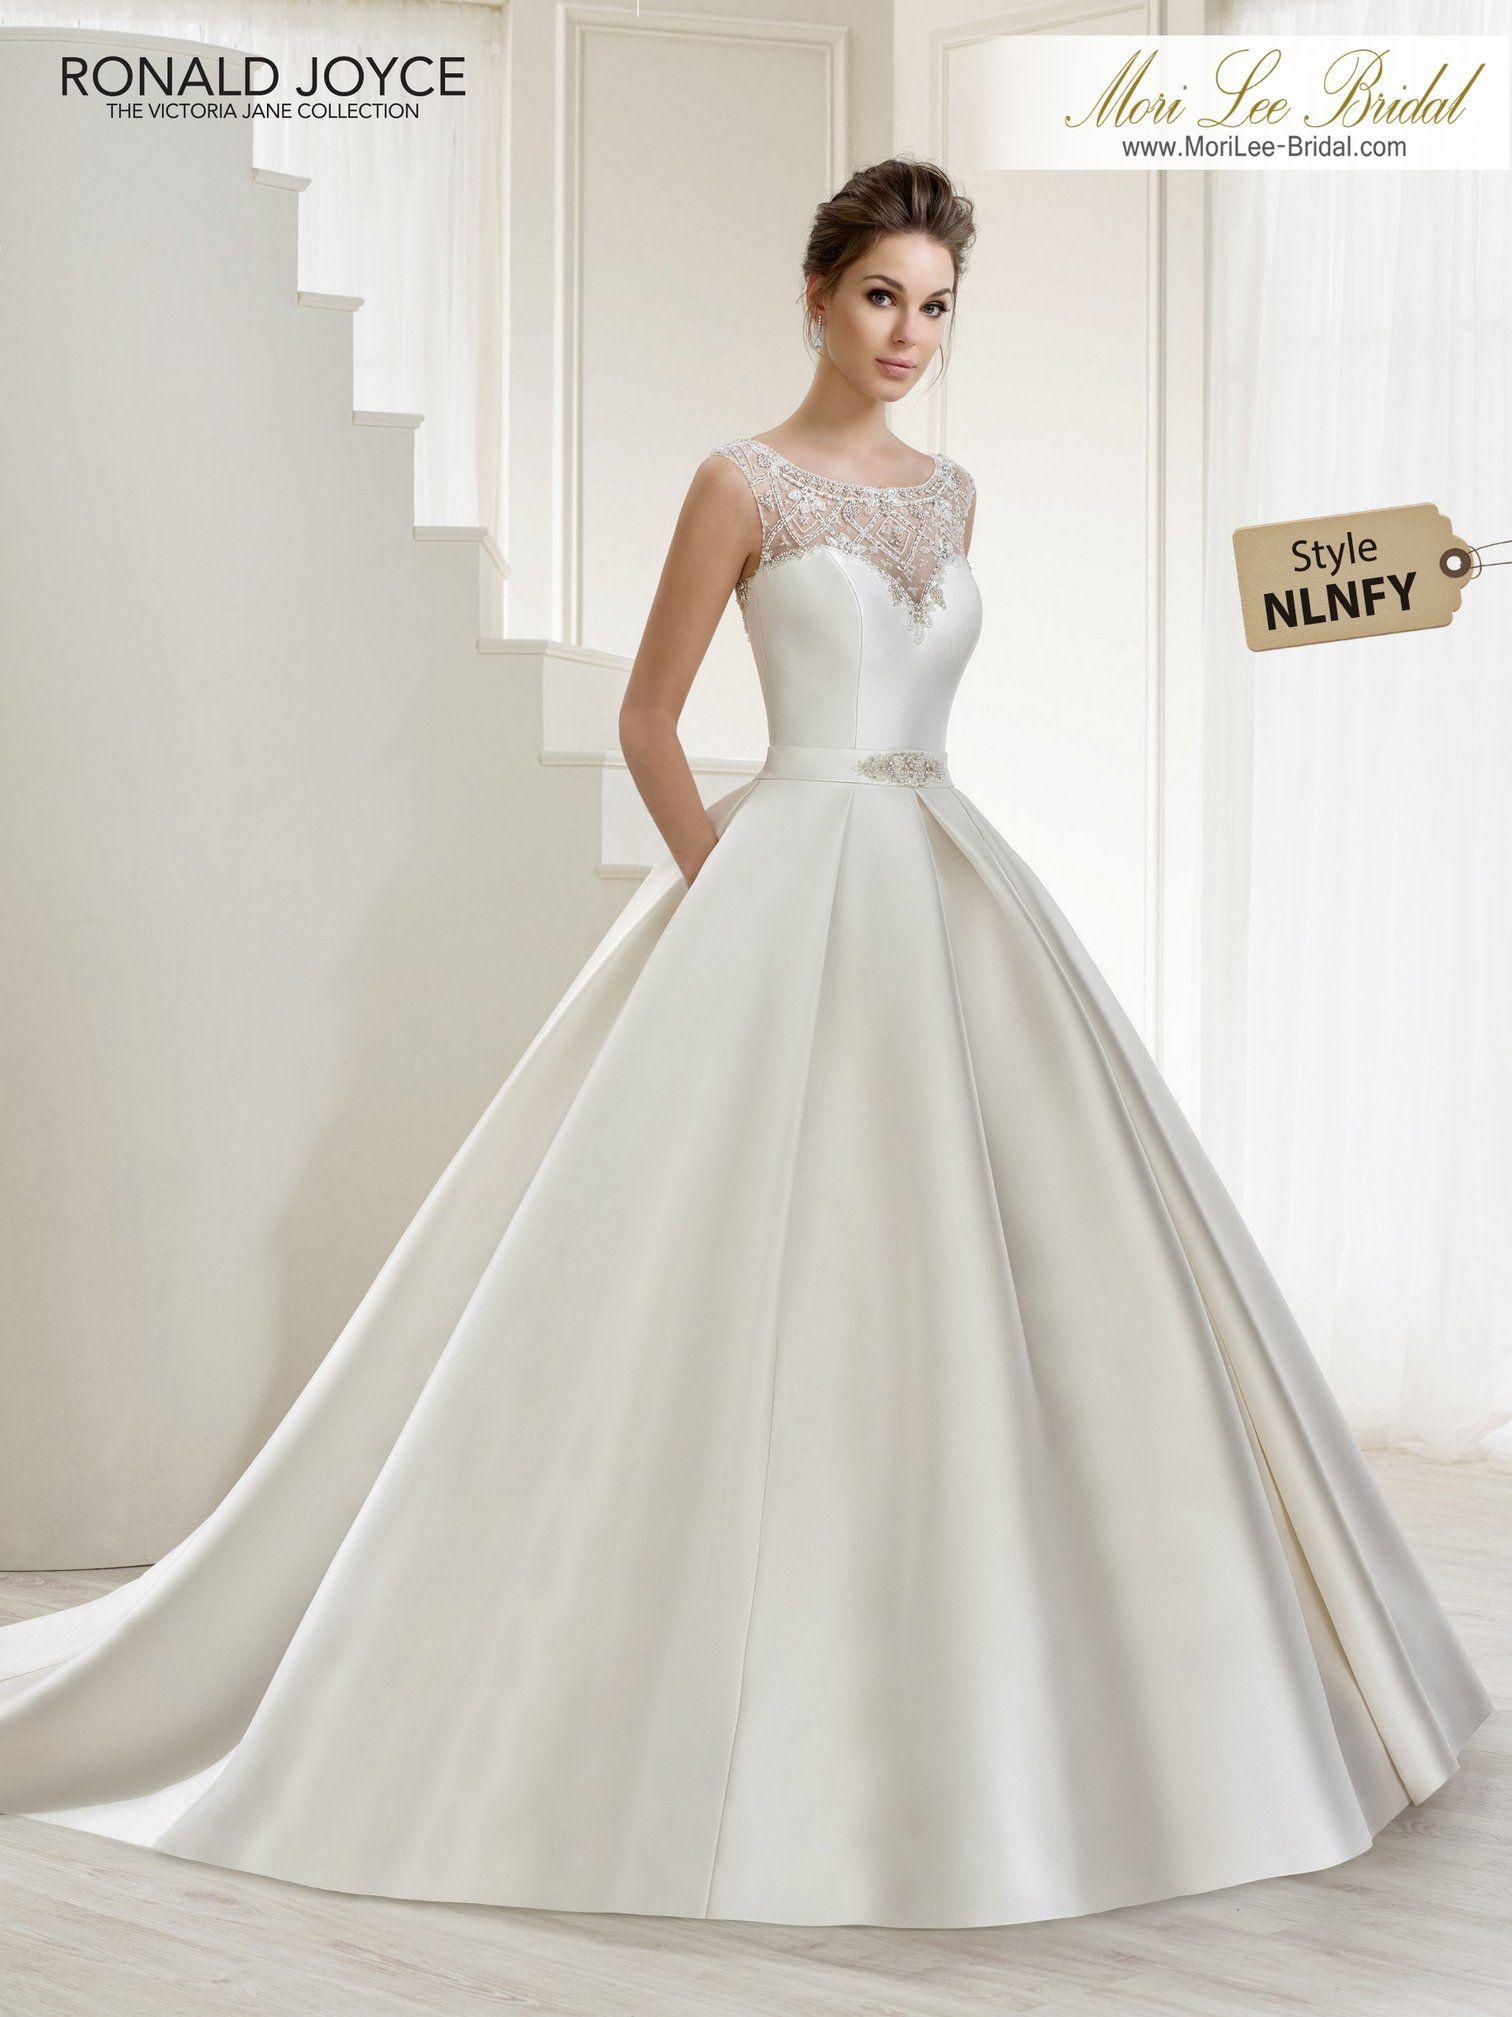 Pin By Monica Tirape On Joe Wedding Dresses Bridal Dresses Elegant Wedding Dress [ 2017 x 1512 Pixel ]